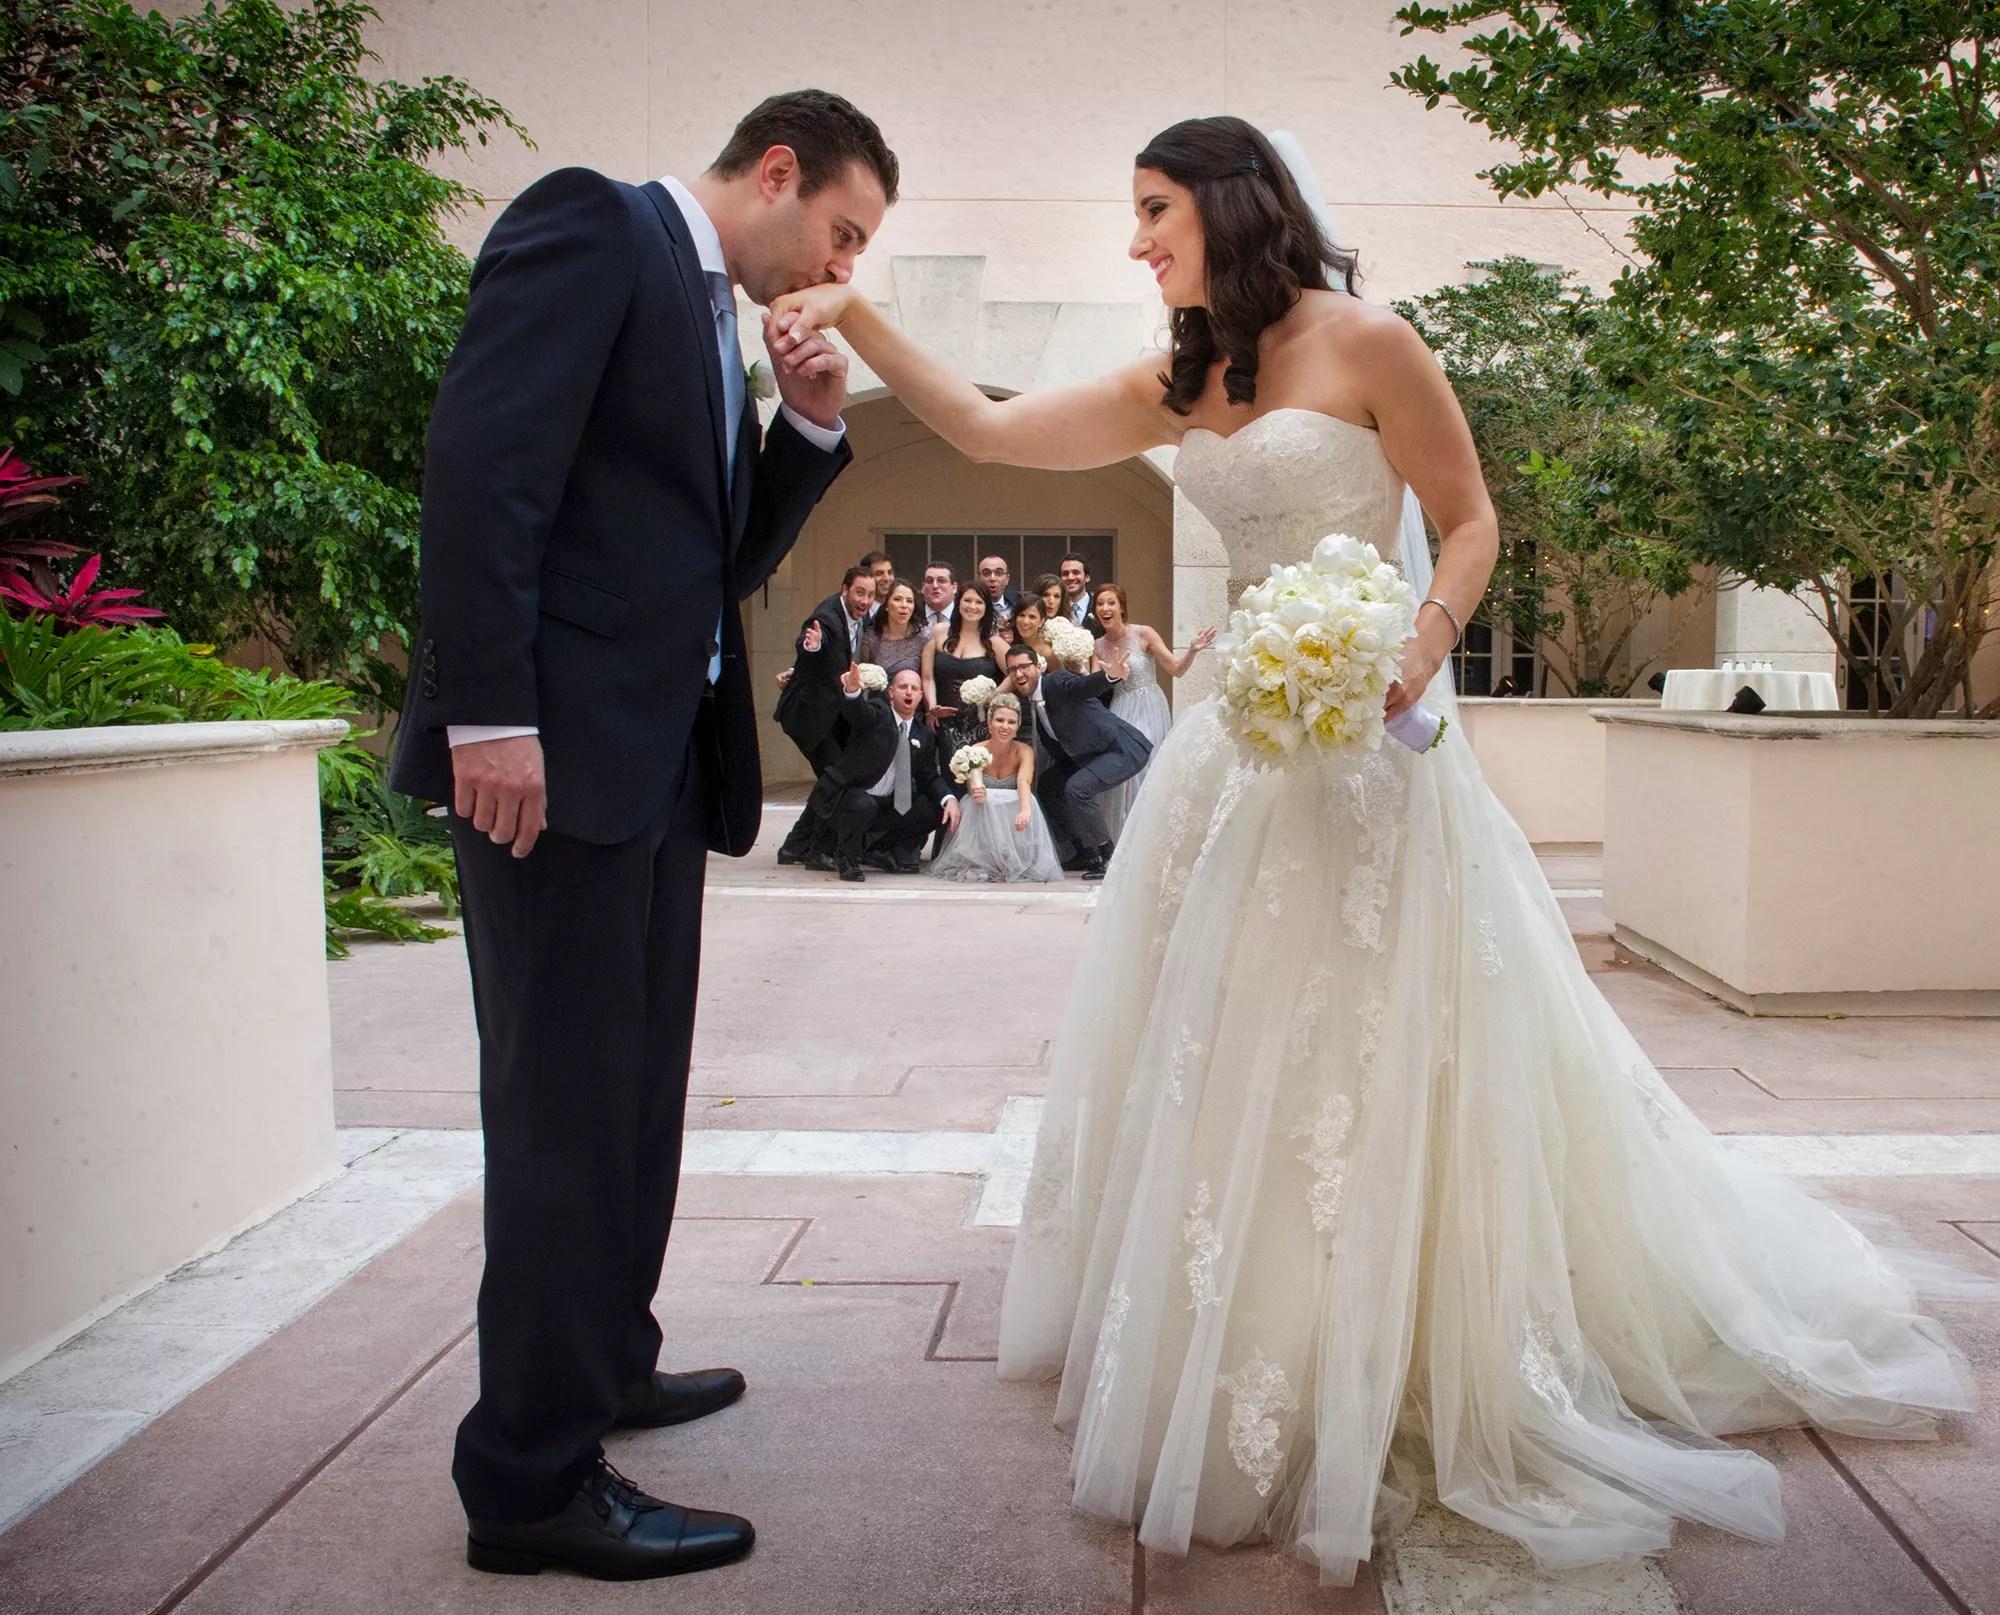 A Traditional Jewish Wedding at Hyatt Regency Coral Gables